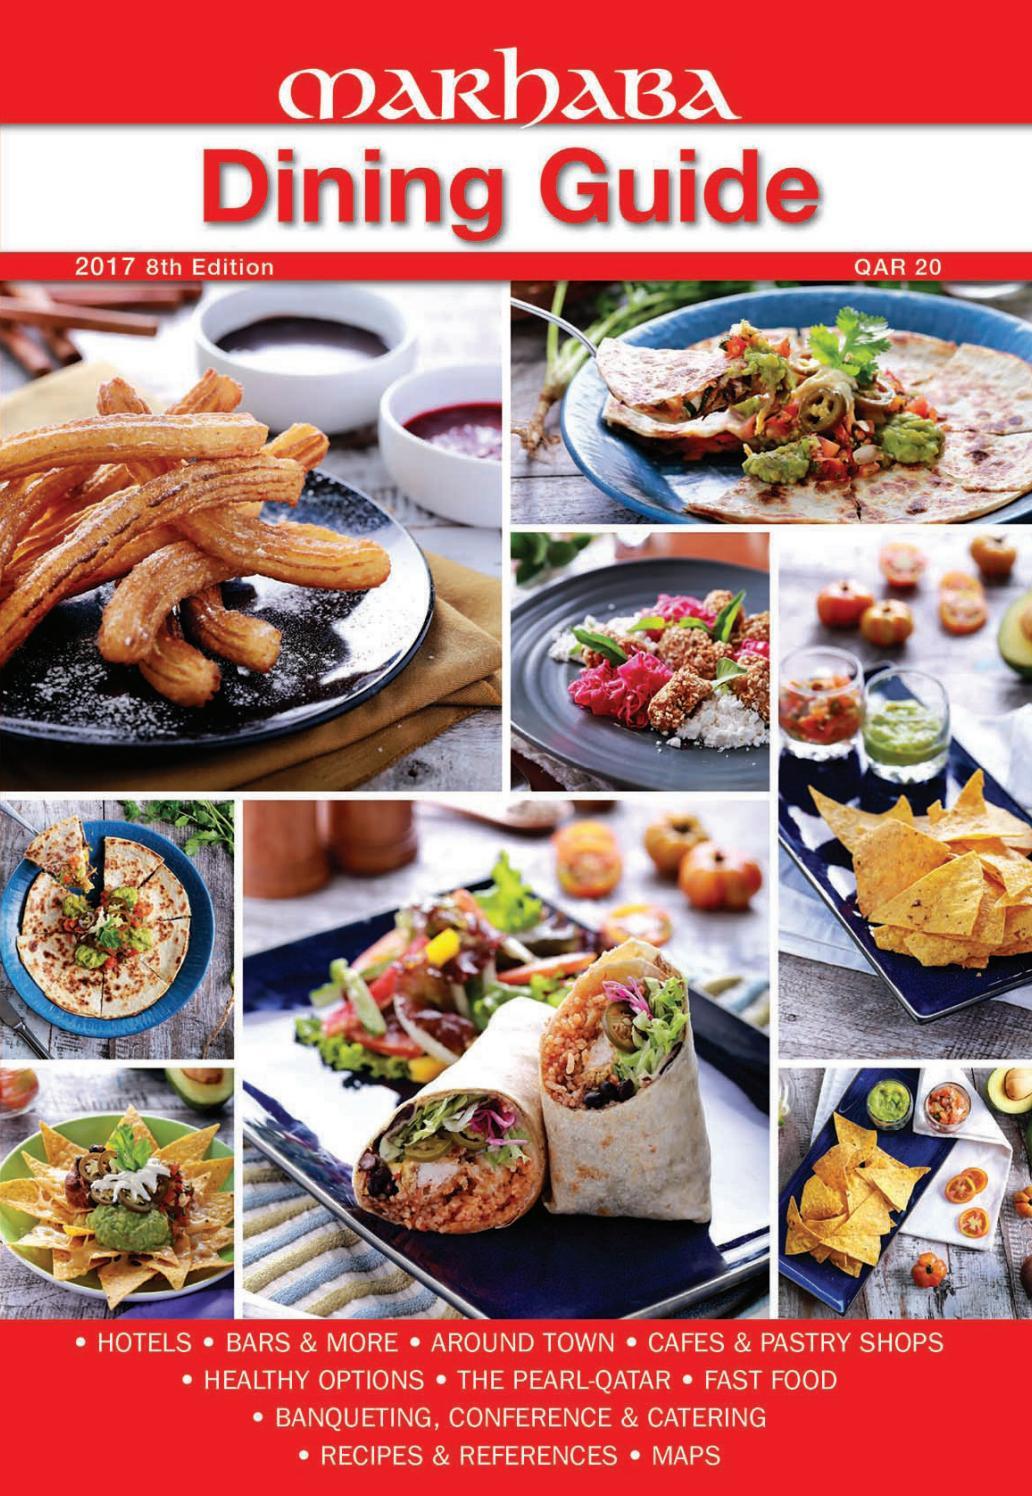 Marhaba Dining Guide 2017 8th Edition By Hilary Bainbridge Issuu Terry Palmer Premium Towel Bath Ampamp Travel 500g Set2tp1001 Set Of 2 Light Blue